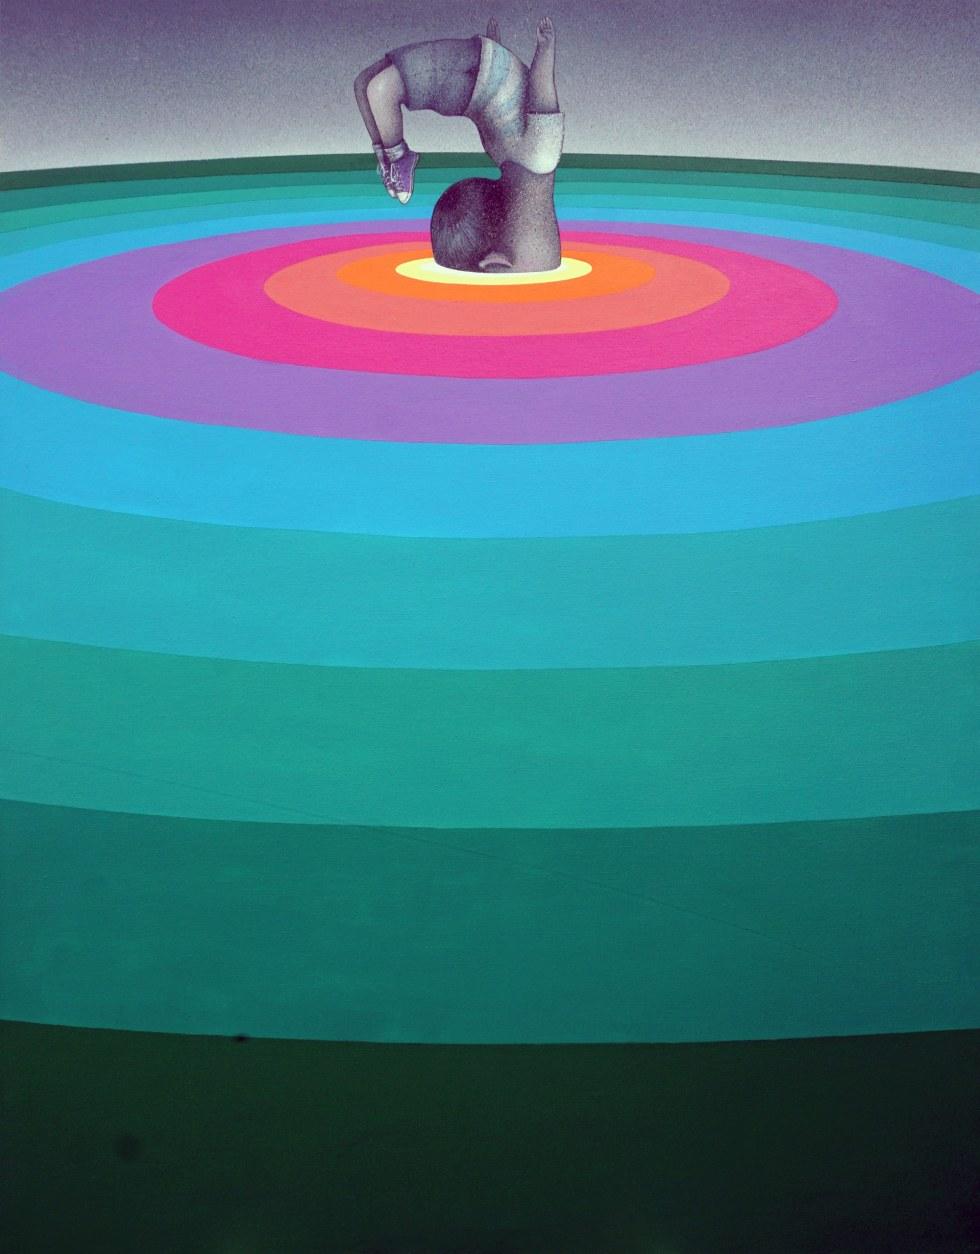 """Aut Viam Inveniam Aut Faciam,"" Acrylic and spray paint on canvas, 114 x 146 cm"